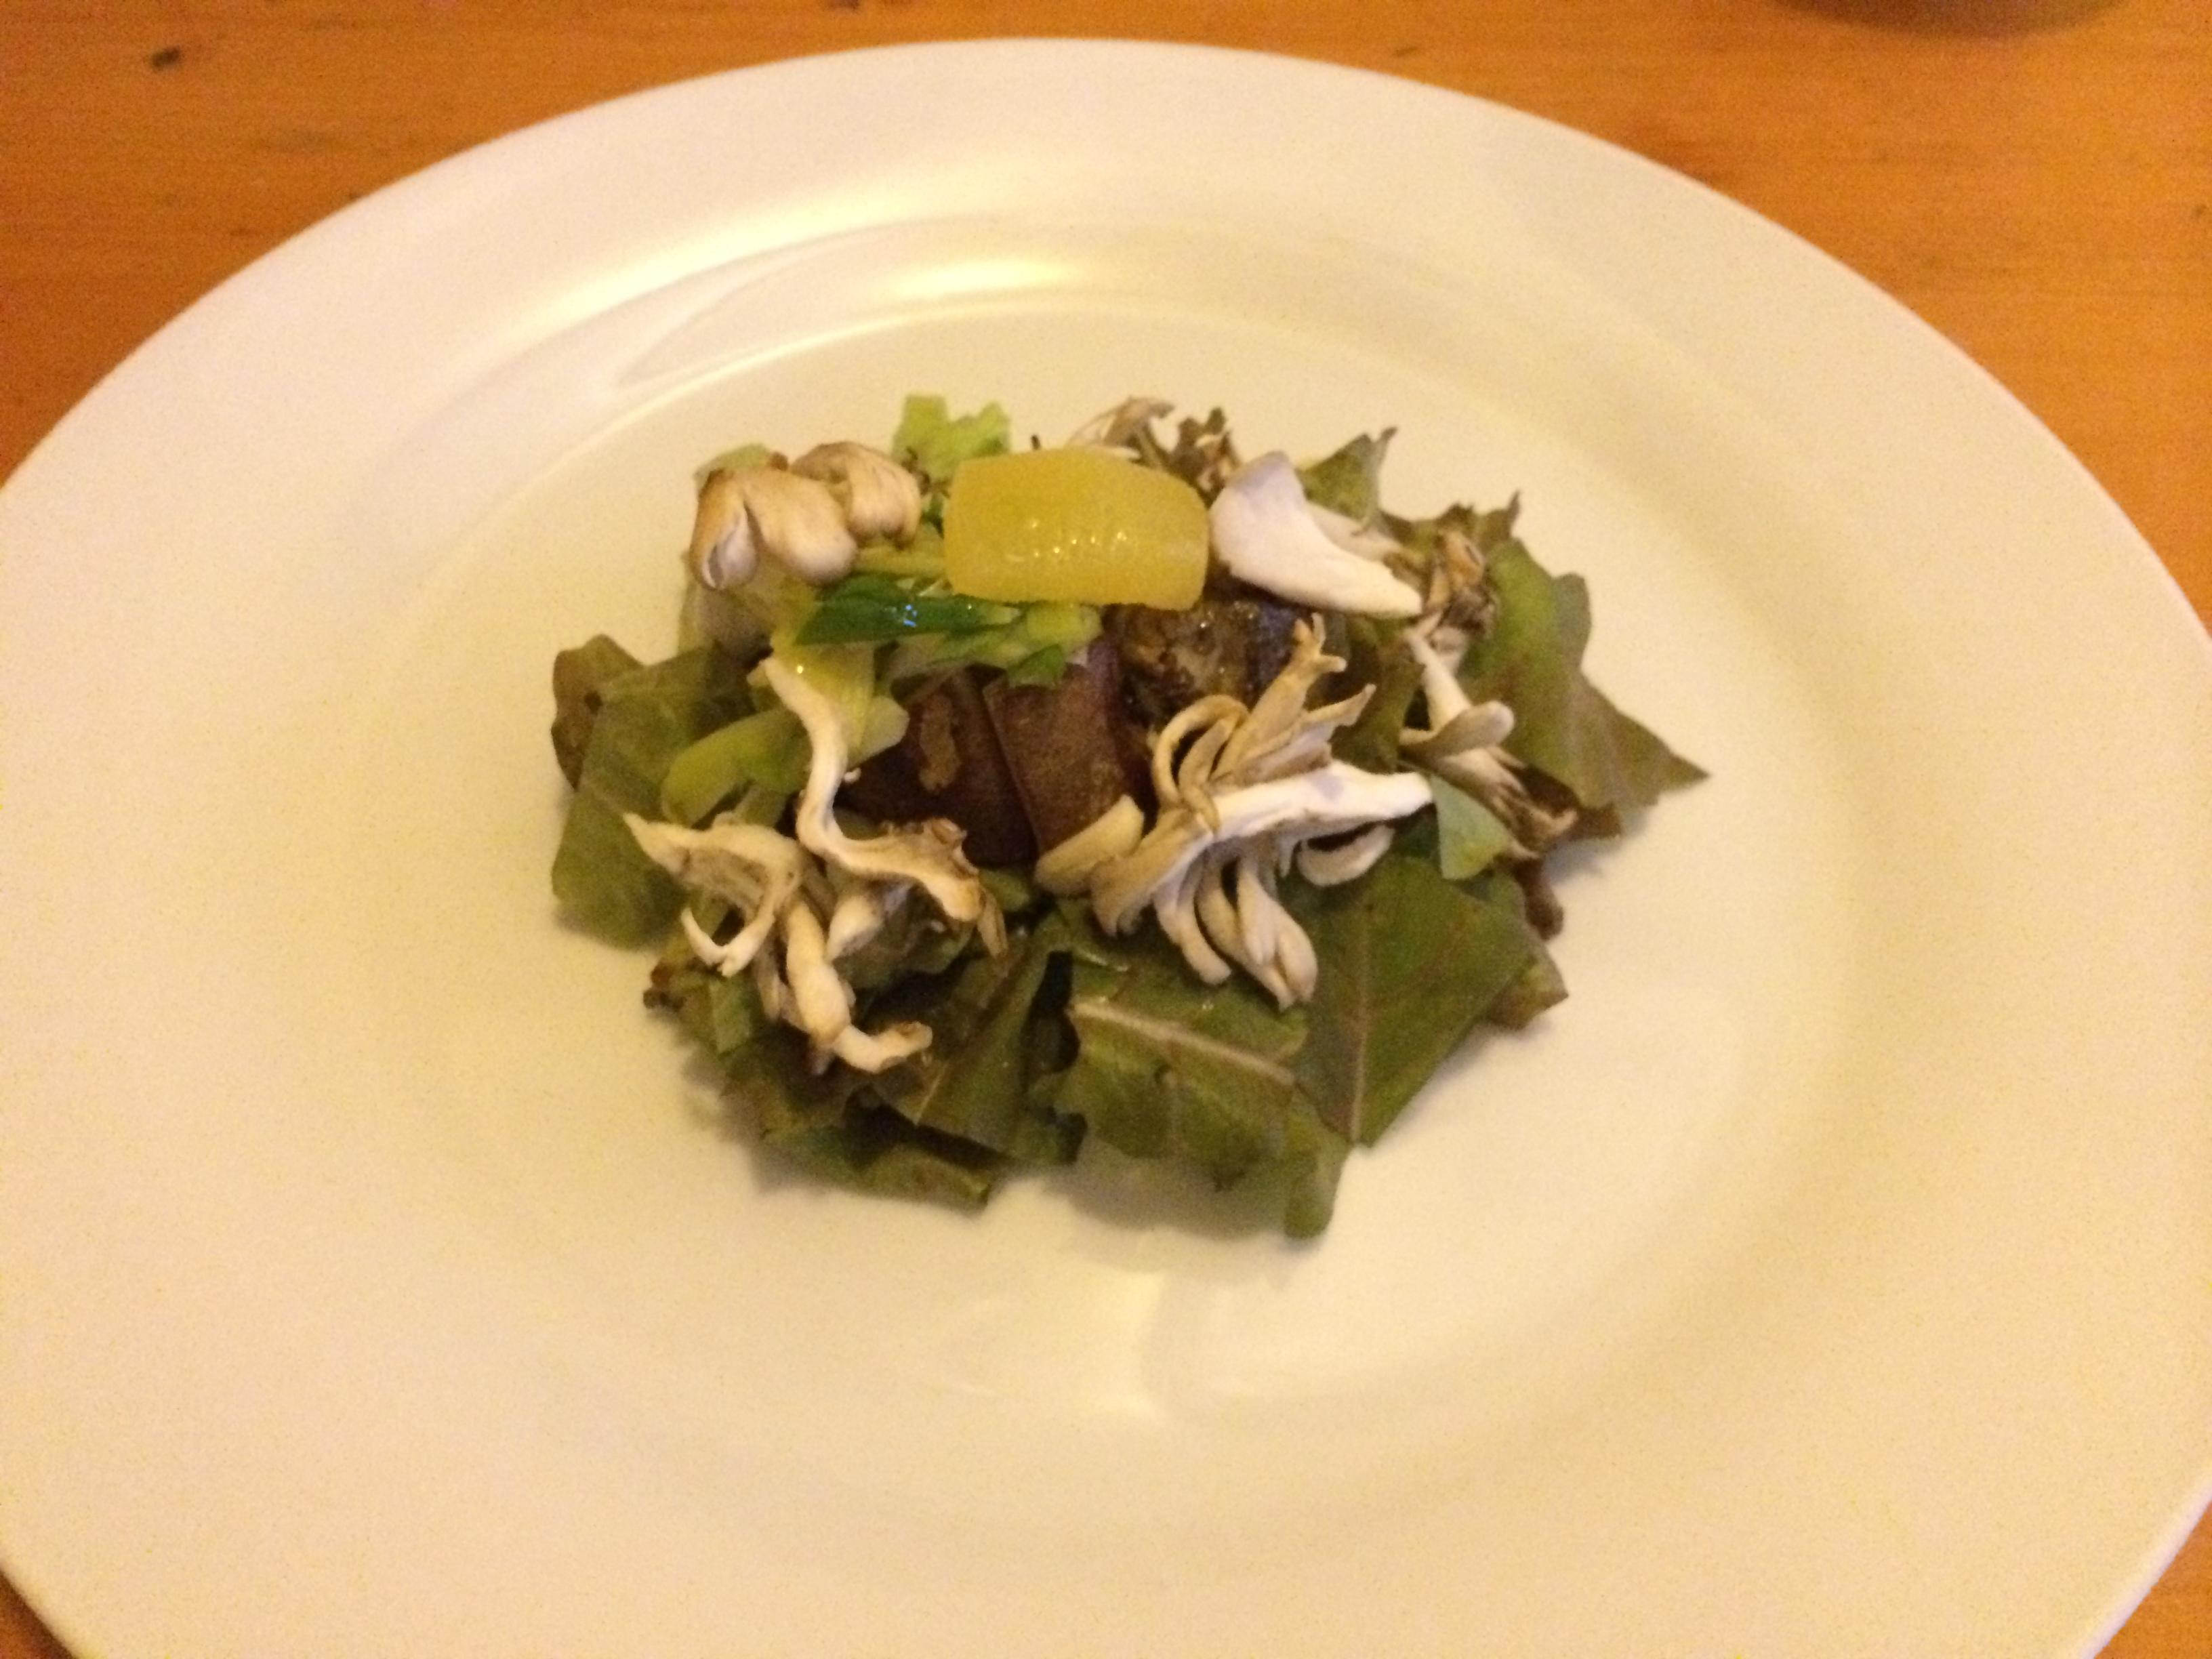 Bistro la fourchette生野菜と温野菜のサラダ